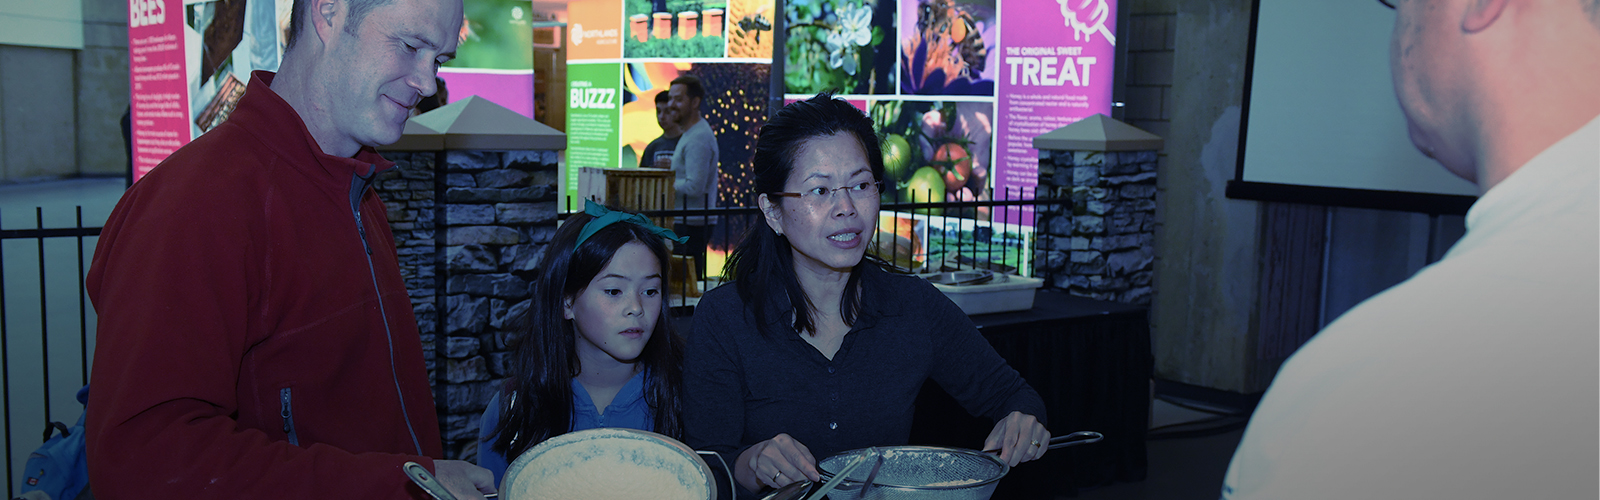 Northlands Food Lab - Nov 7-10